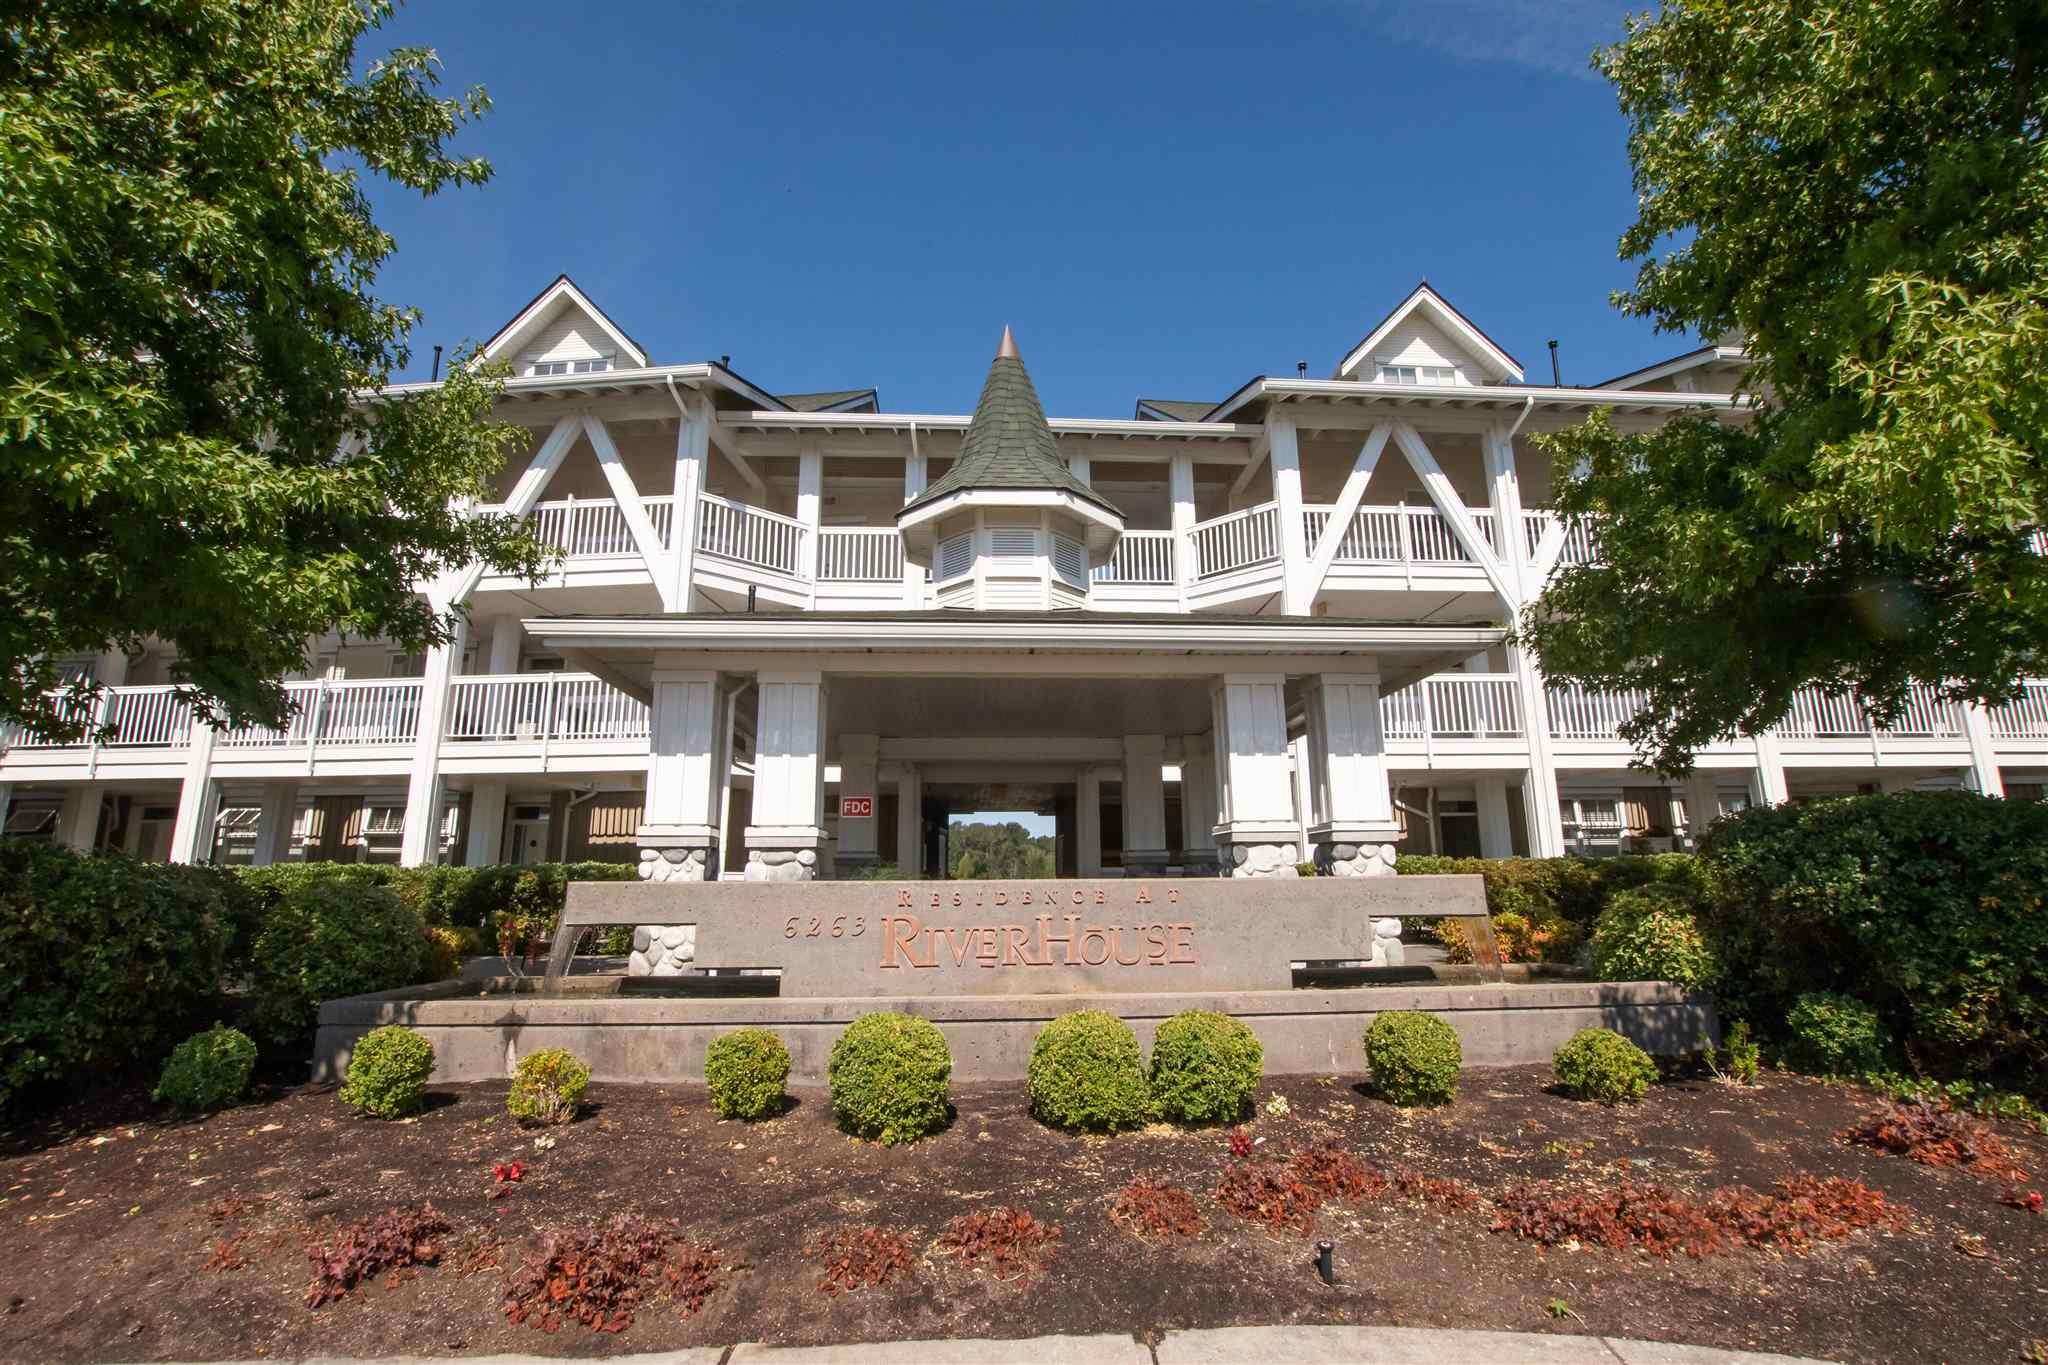 206 6263 RIVER ROAD - East Delta Apartment/Condo for sale, 2 Bedrooms (R2606512) - #1